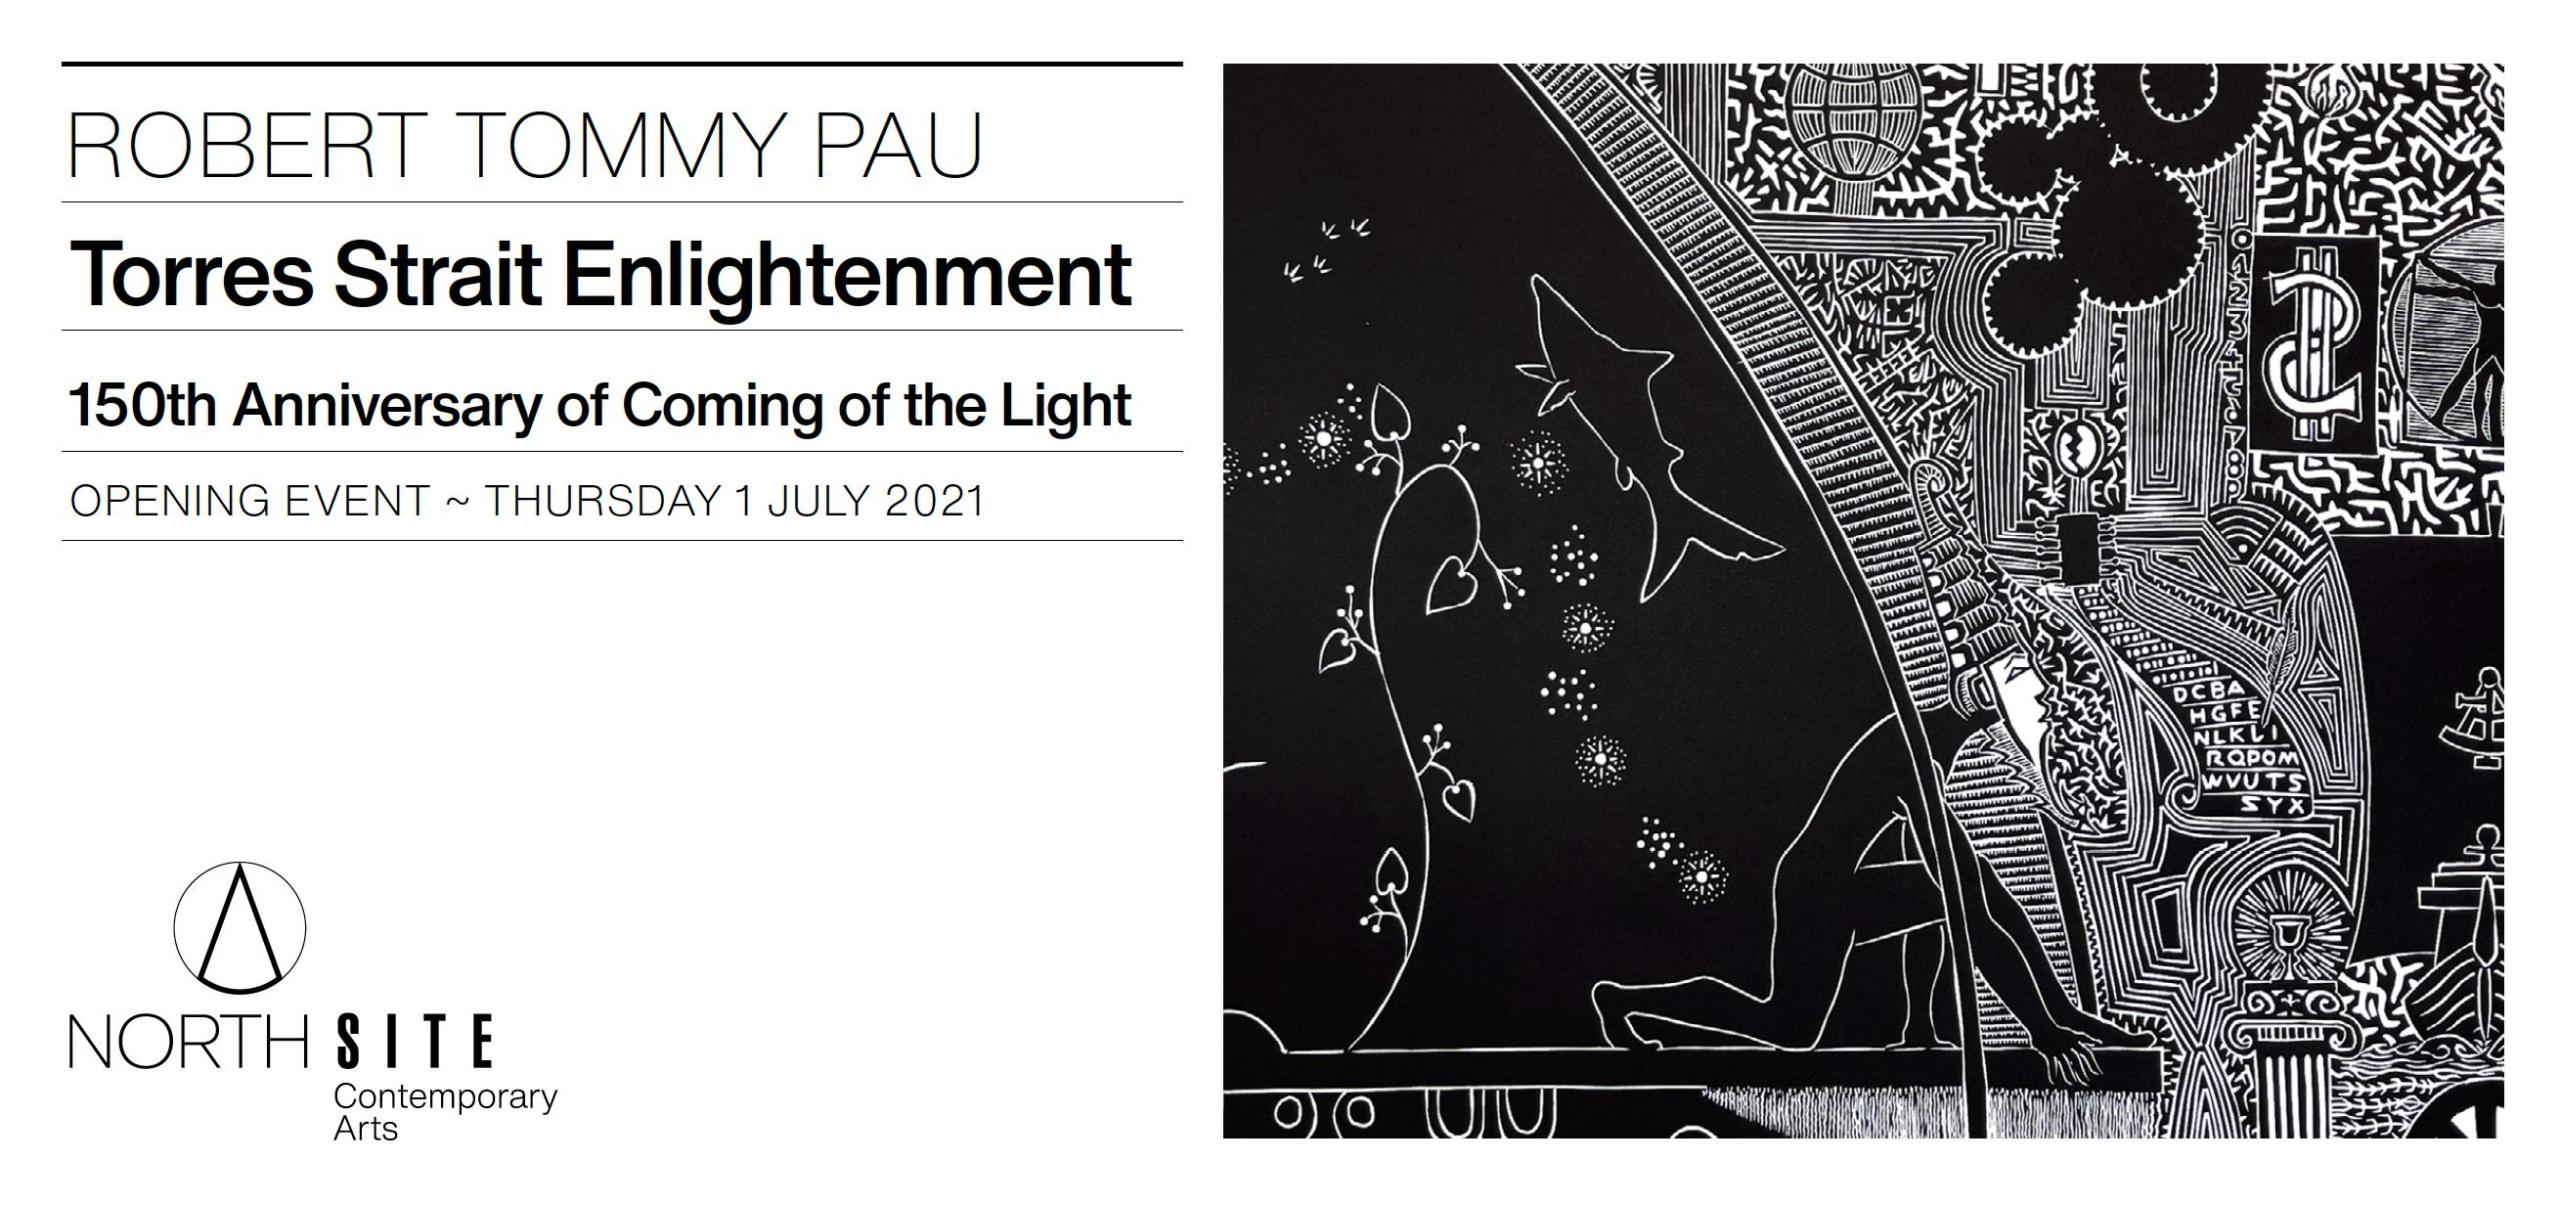 Robert Tommy Pau exhibition invitation